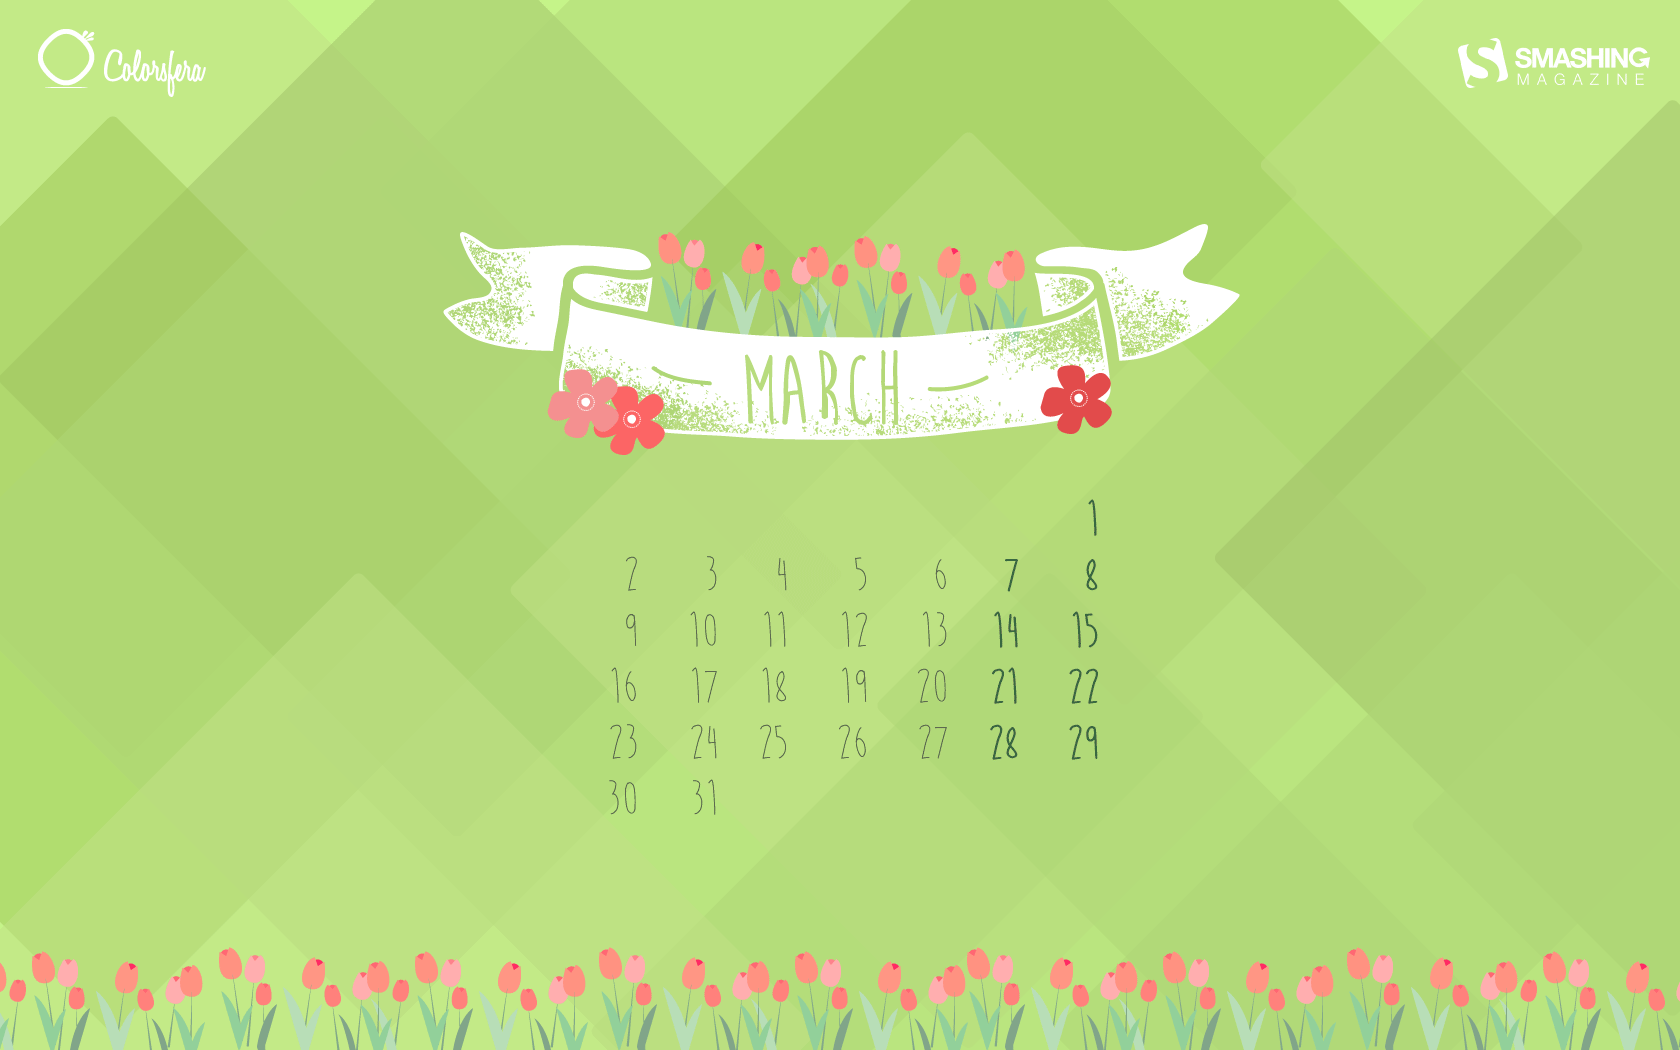 Desktop Wallpaper Calendars: March 2015 – Smashing Magazine